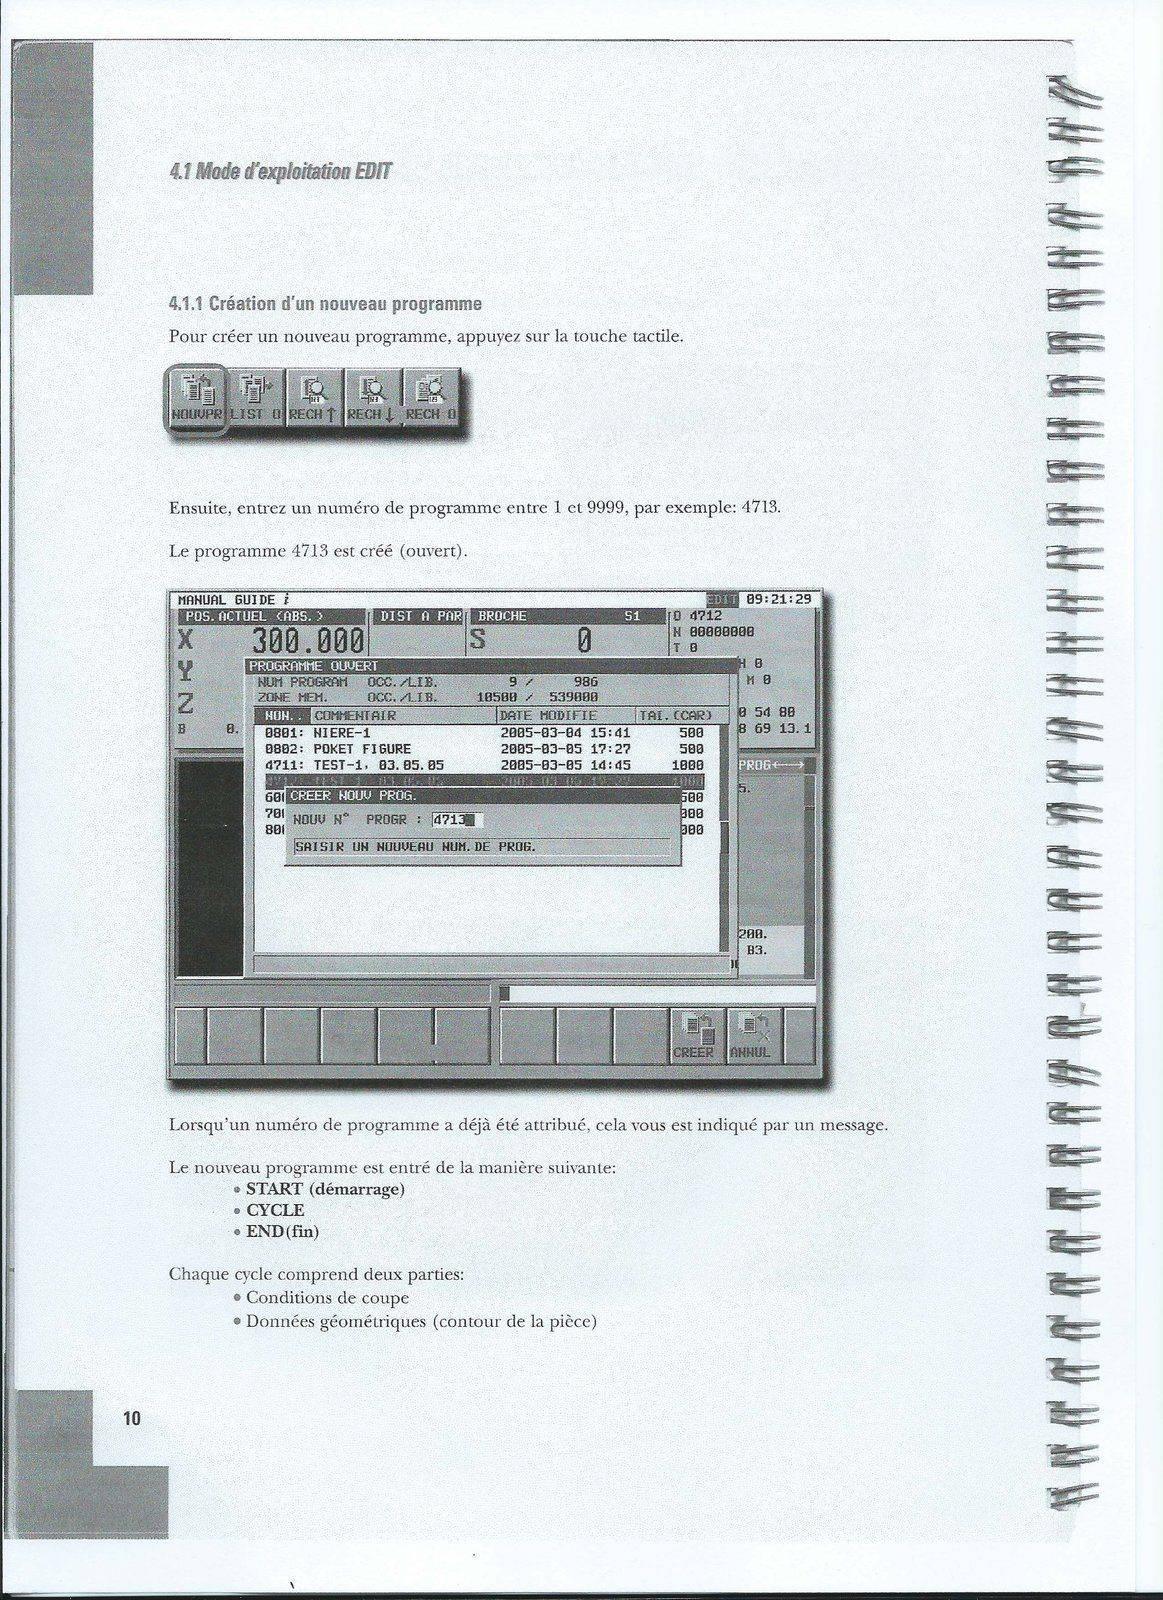 manuel guide 6.jpg